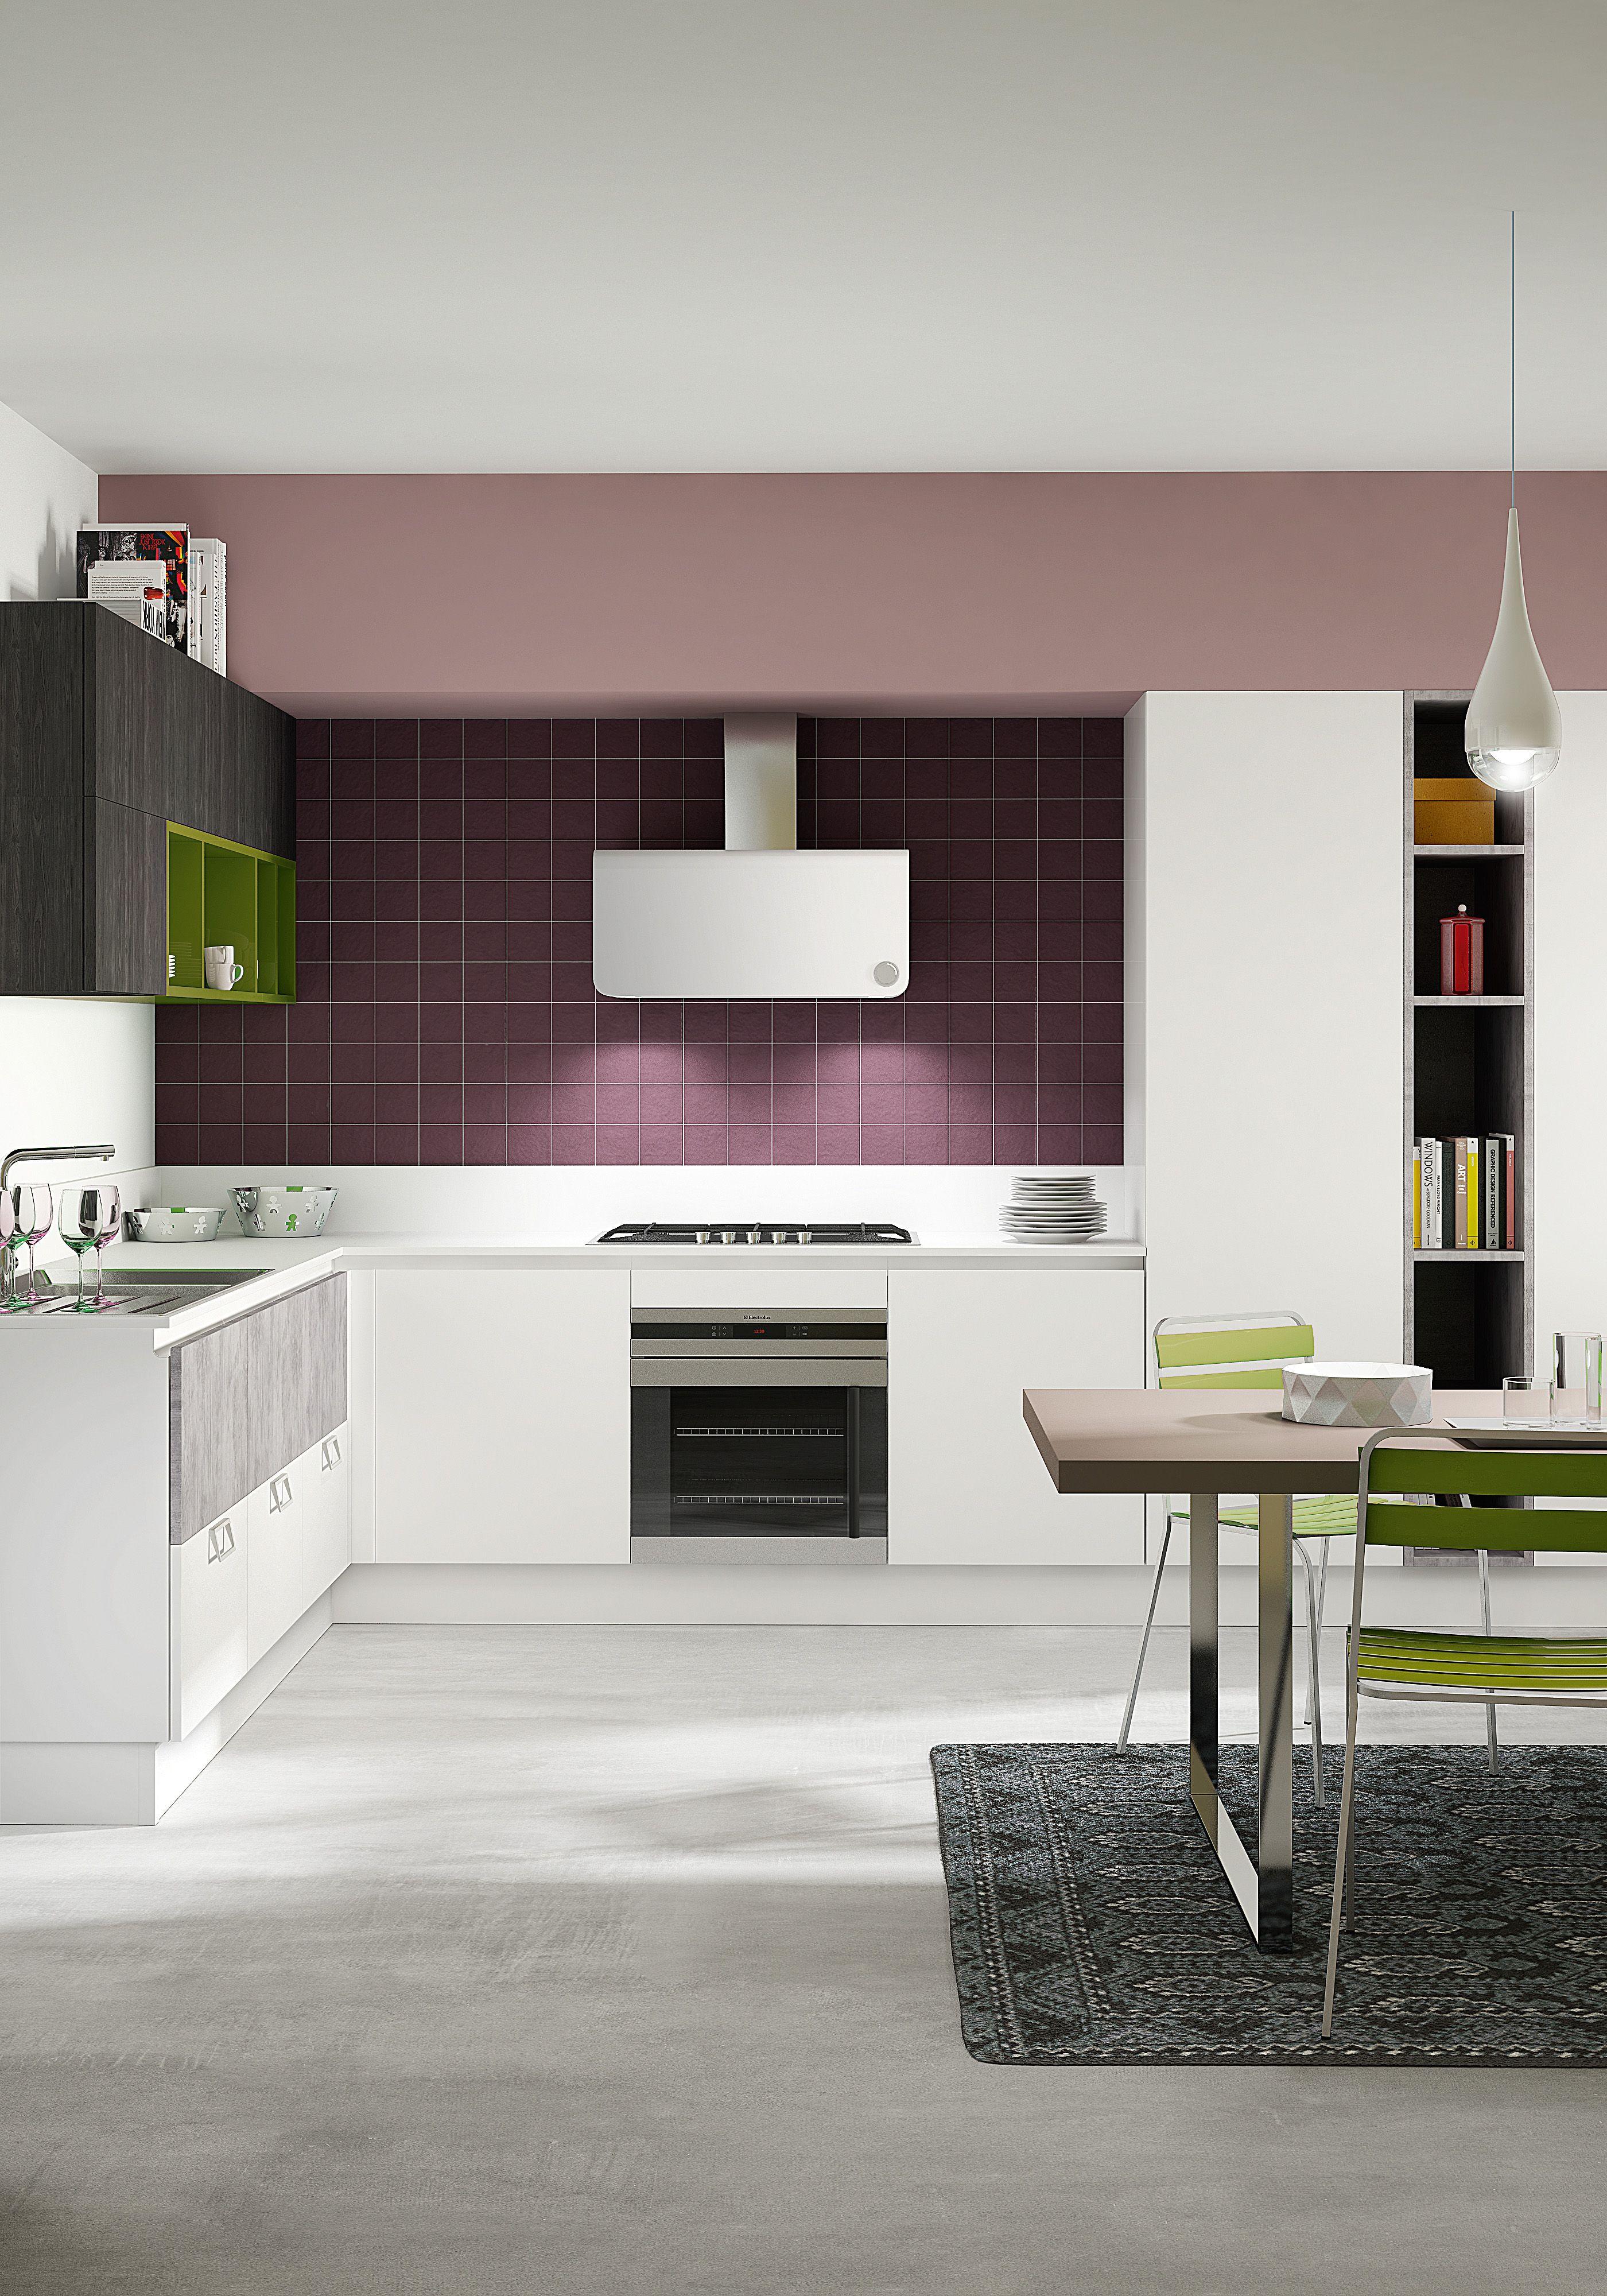 Berloni Cucina B-50 | Live your Kitchen | Pinterest | Kitchens